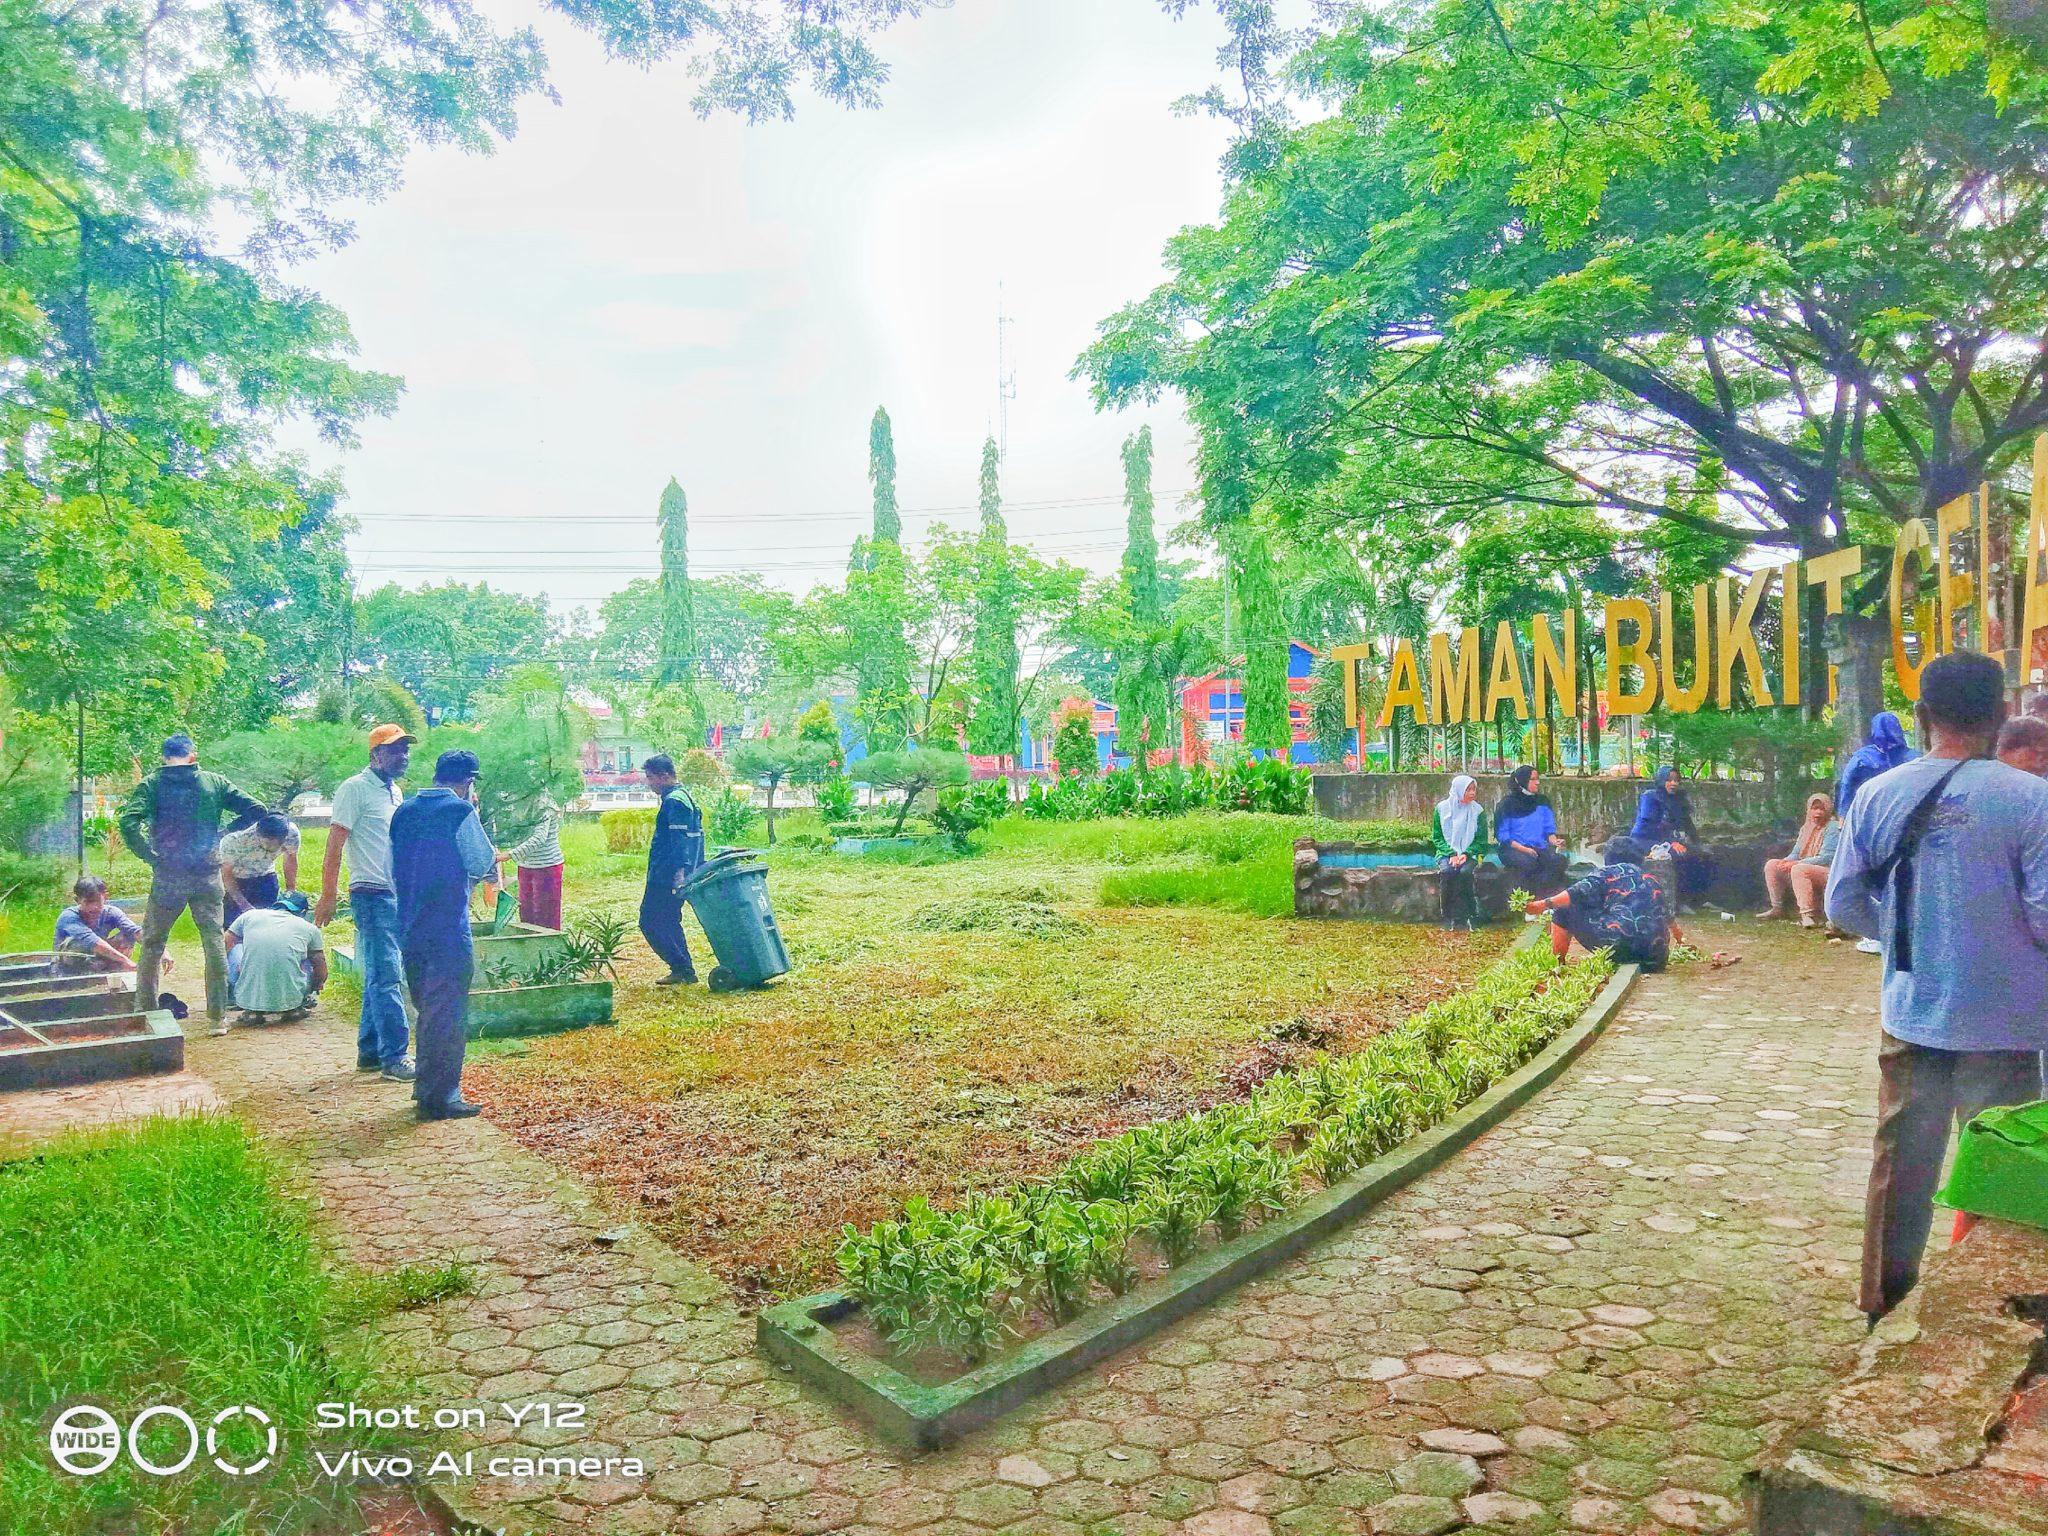 Taman Bukit Gelanggang